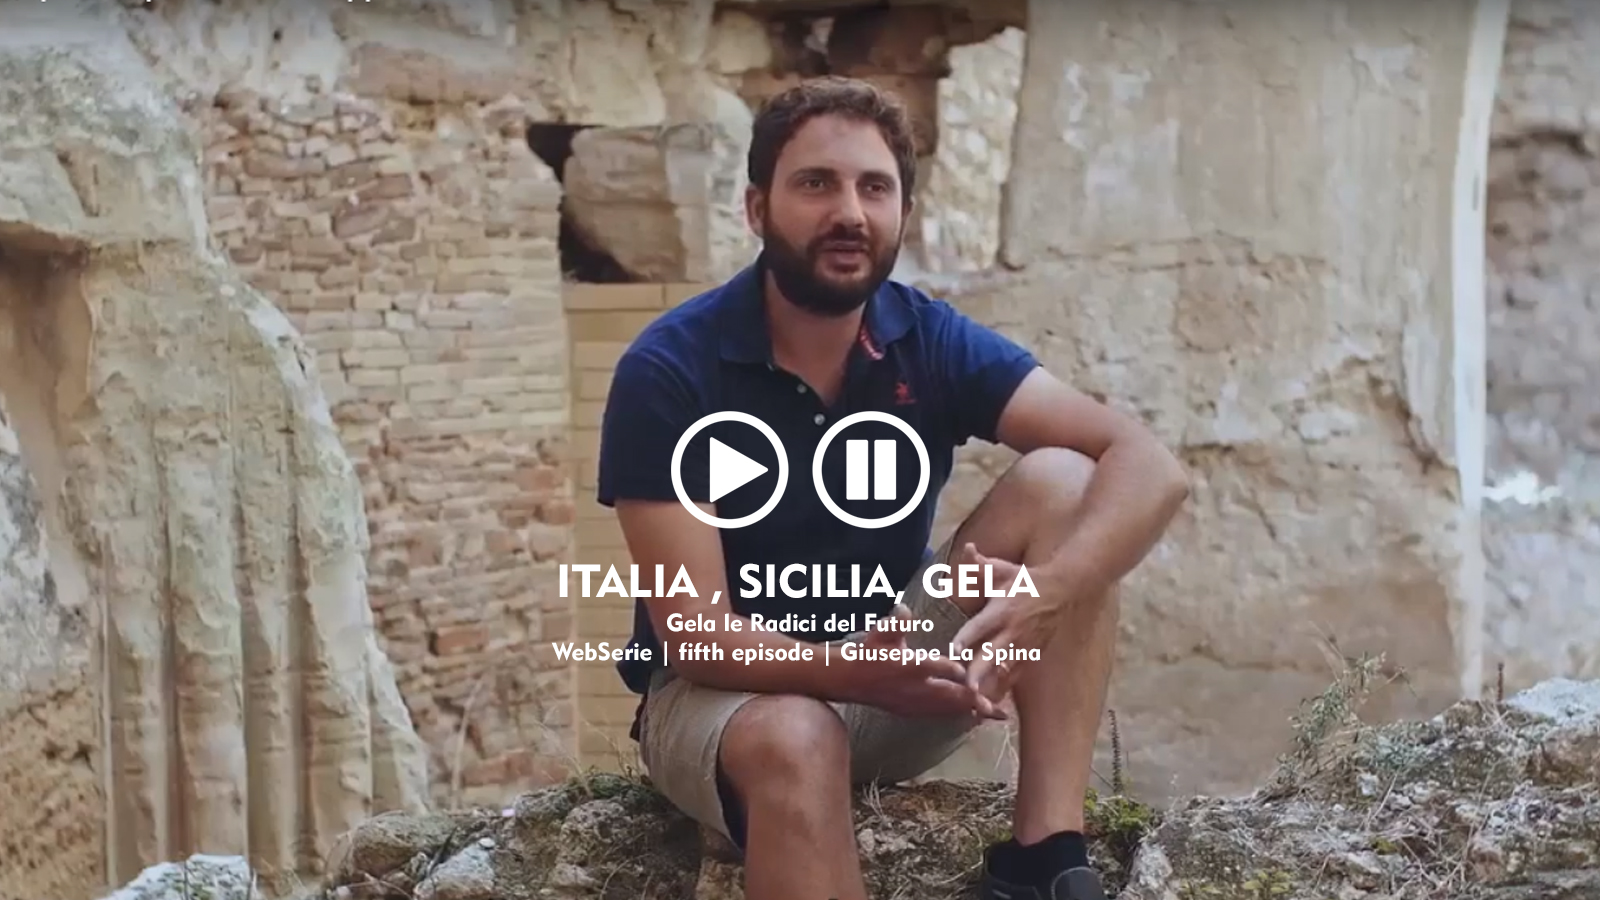 webserie | italia, sicilia, gela | fifth episode | giuseppe